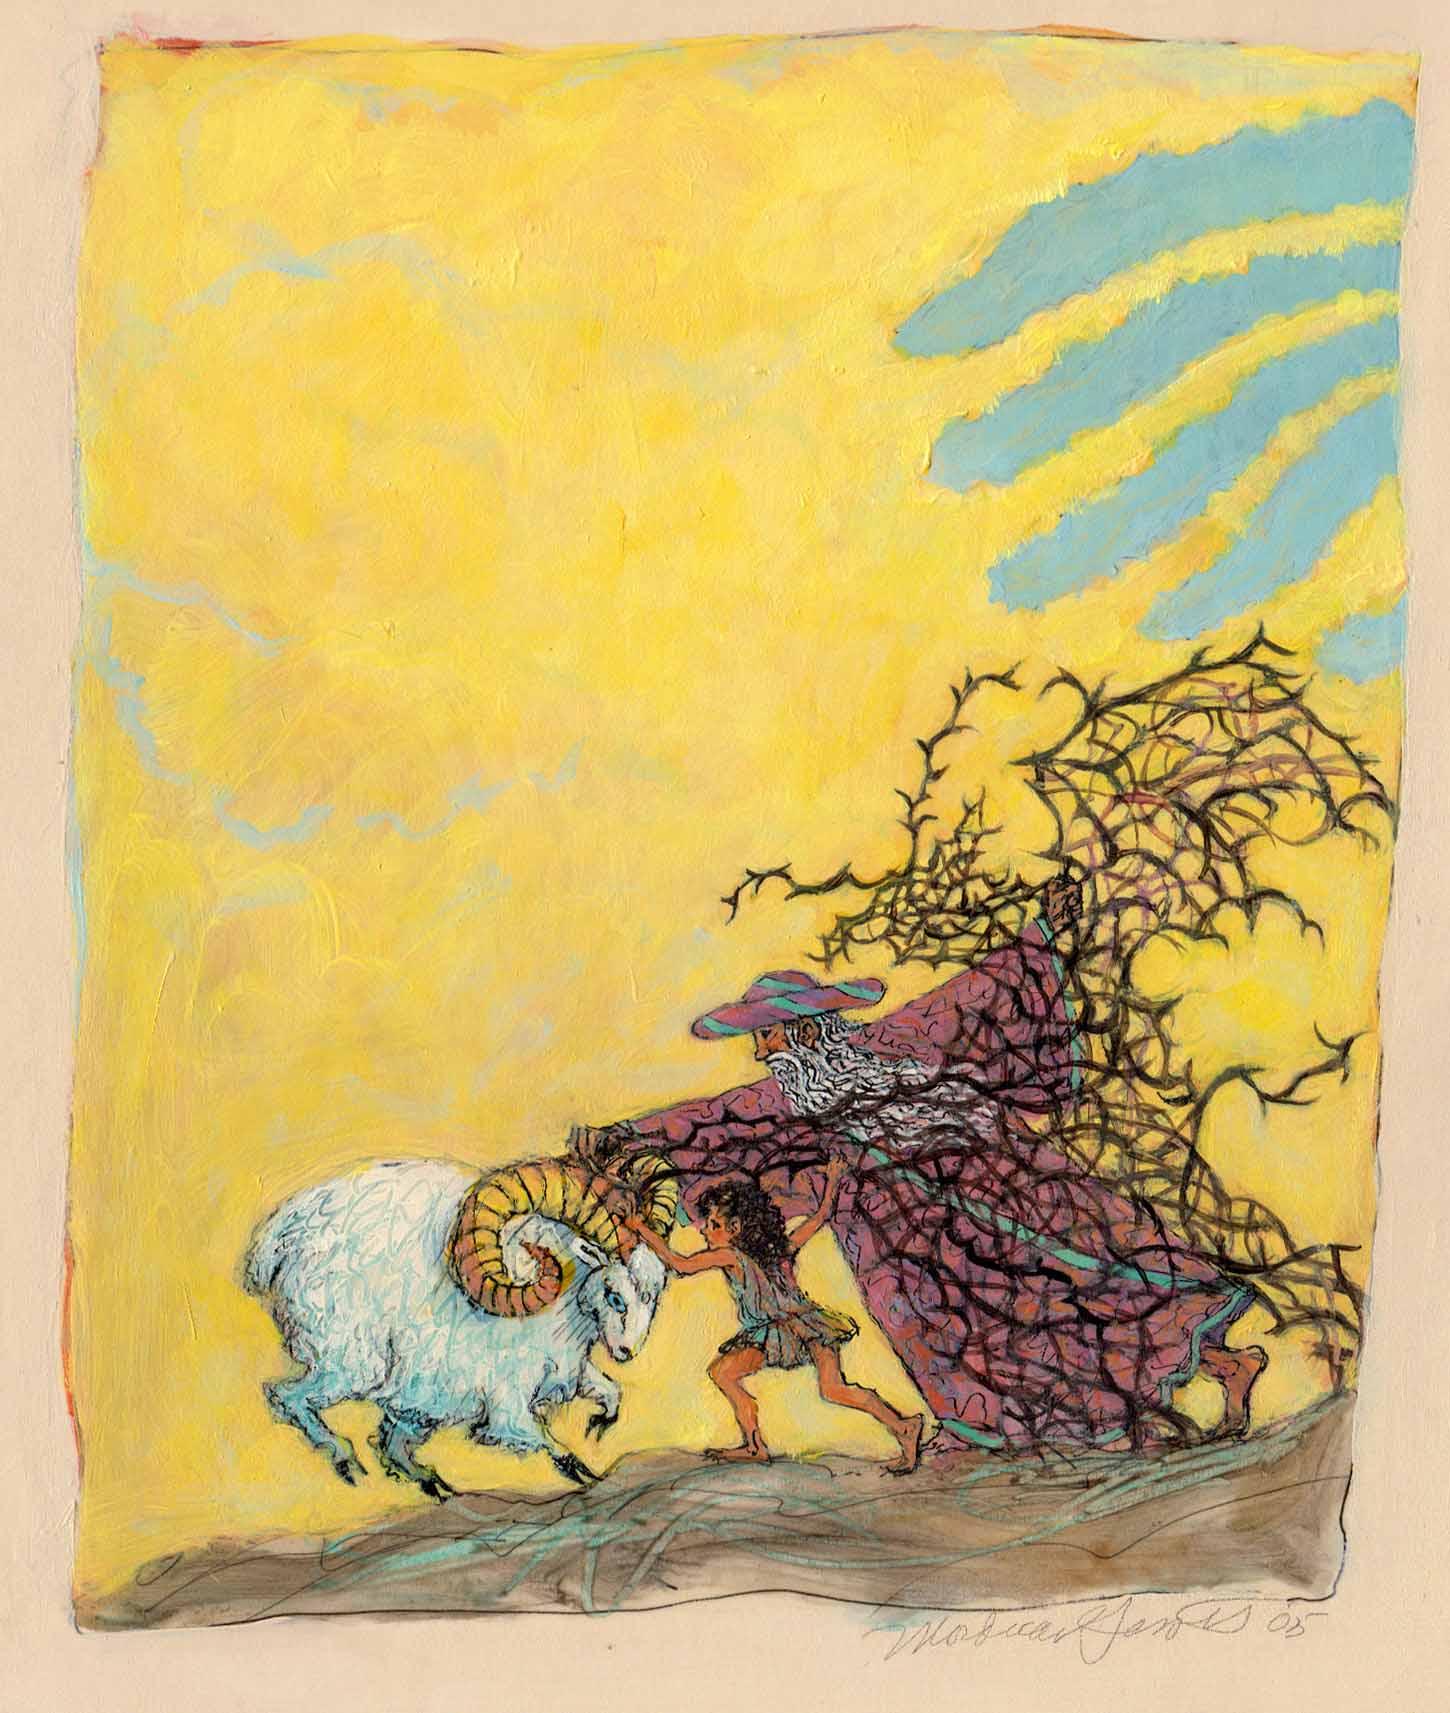 Abraham Frees the Ram